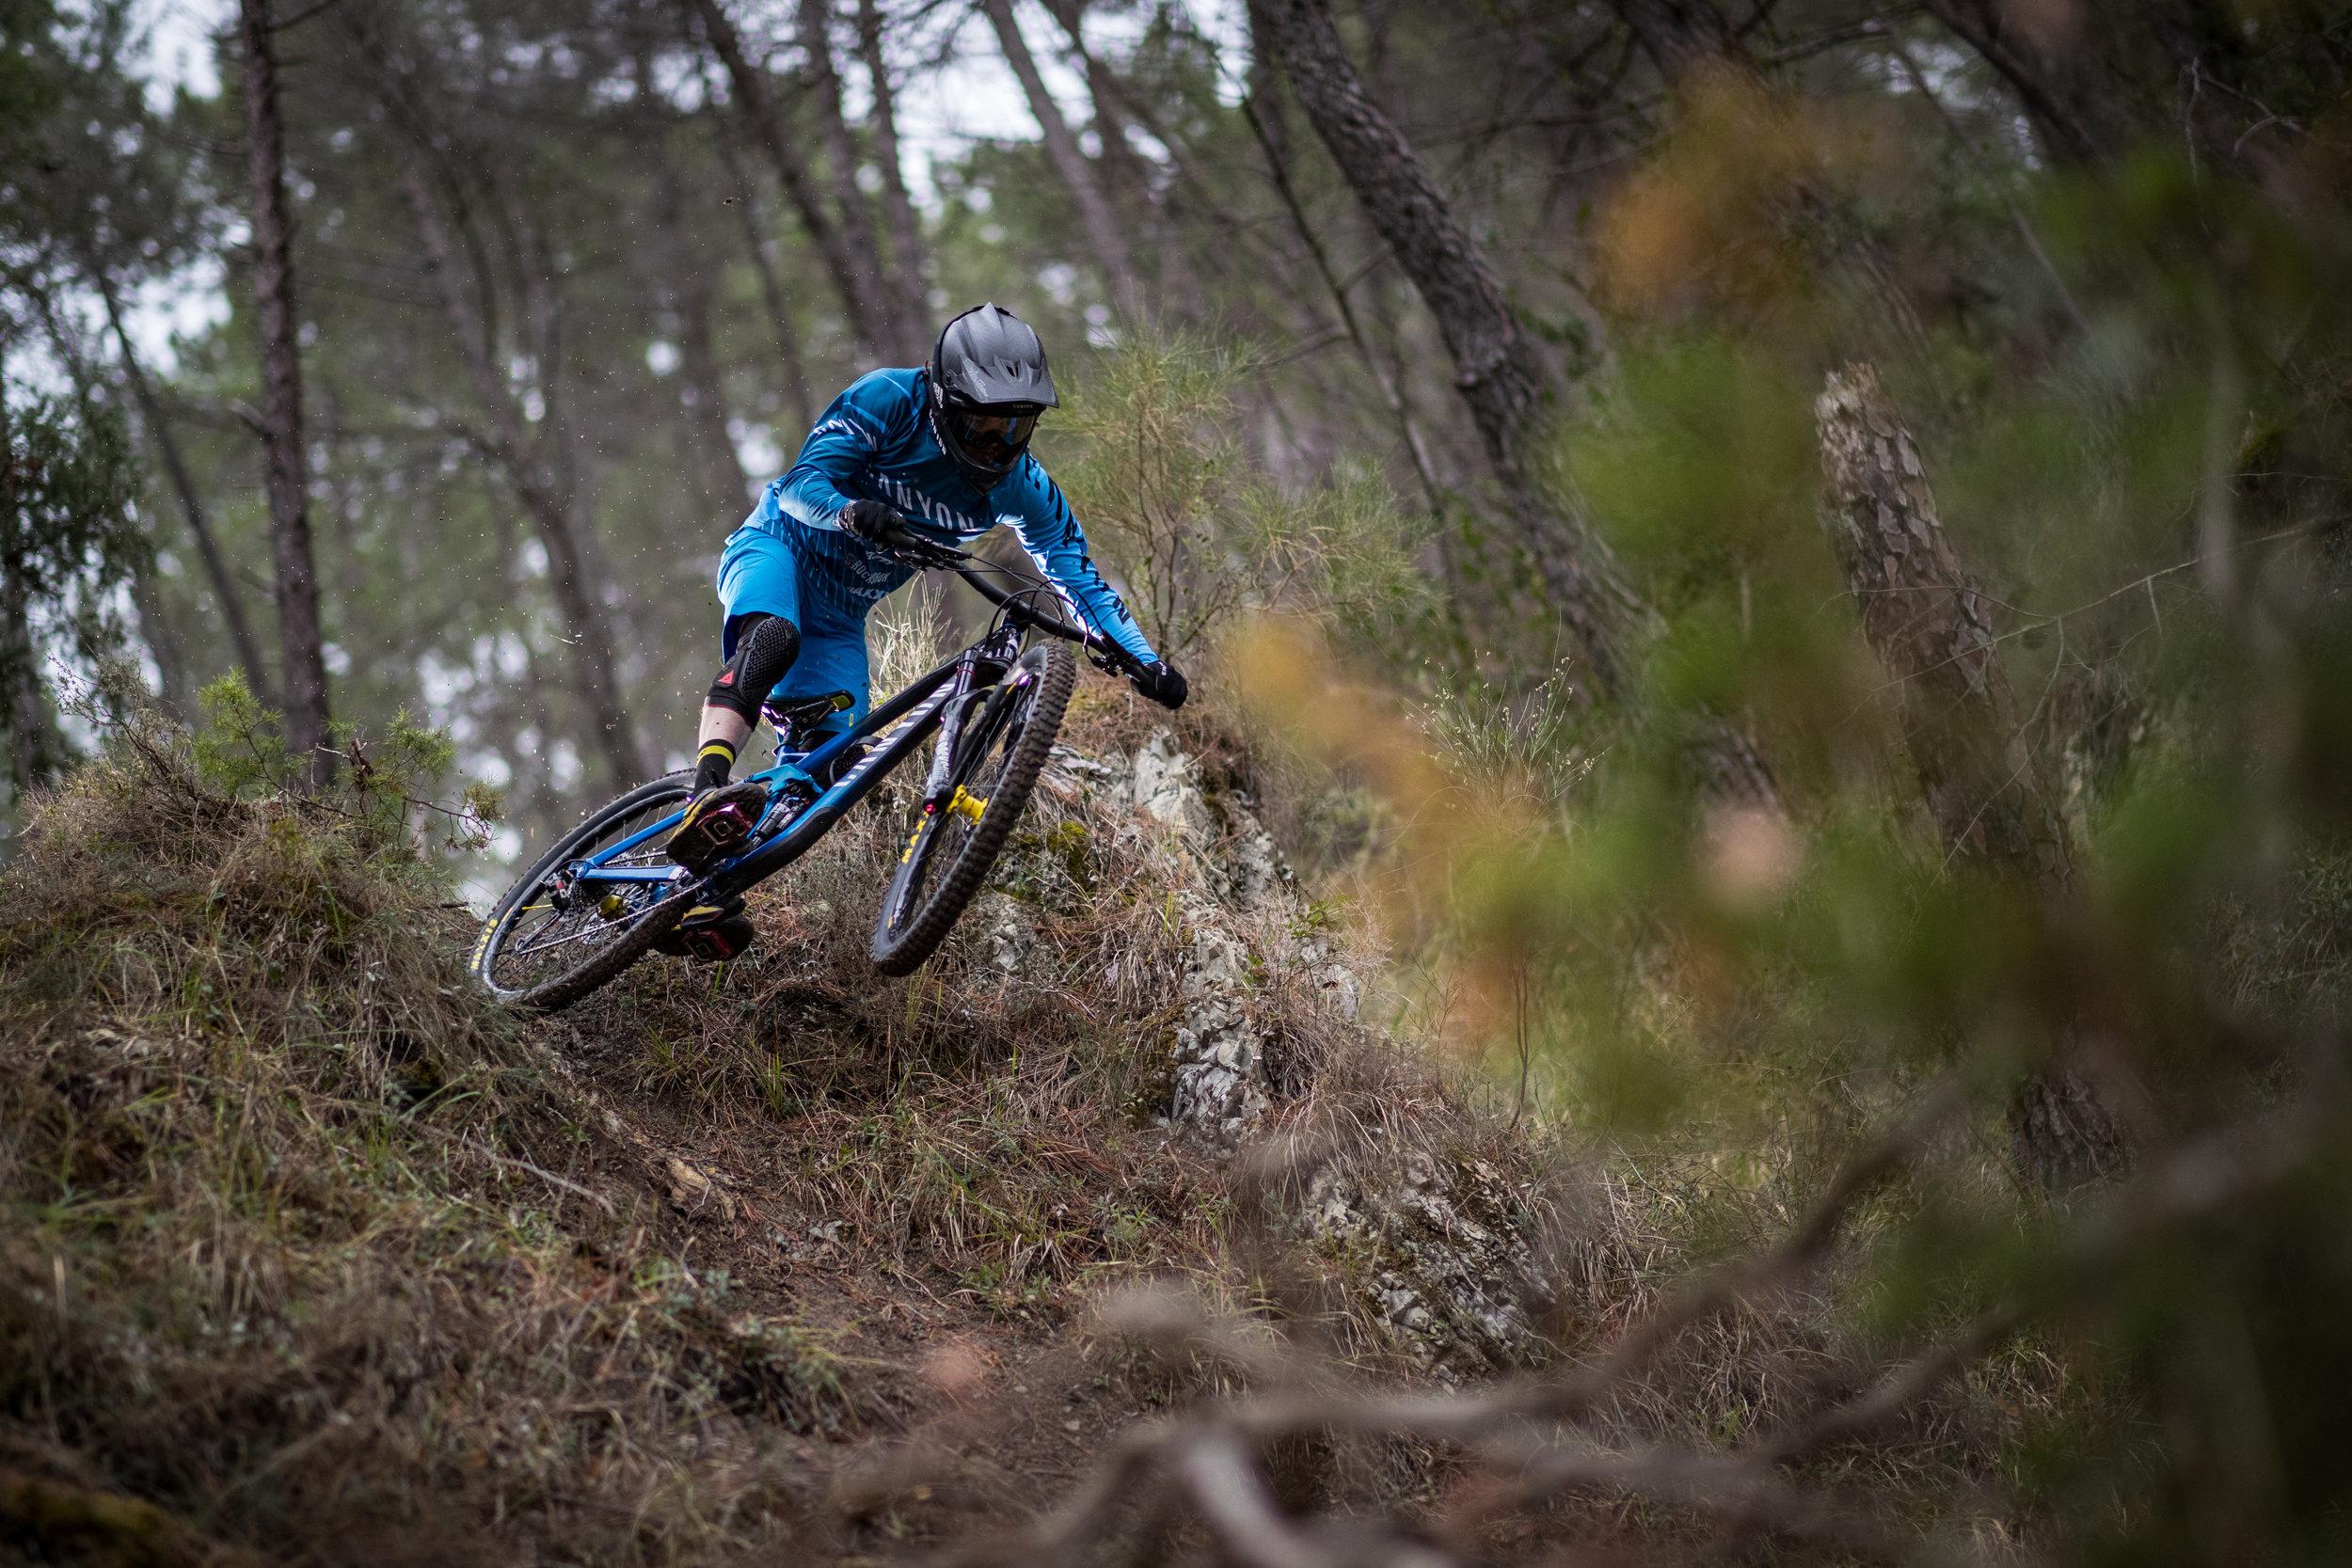 Joe Barnes is back with eyes on the podium. Copyright: Canyon Bicycles Markus Greber